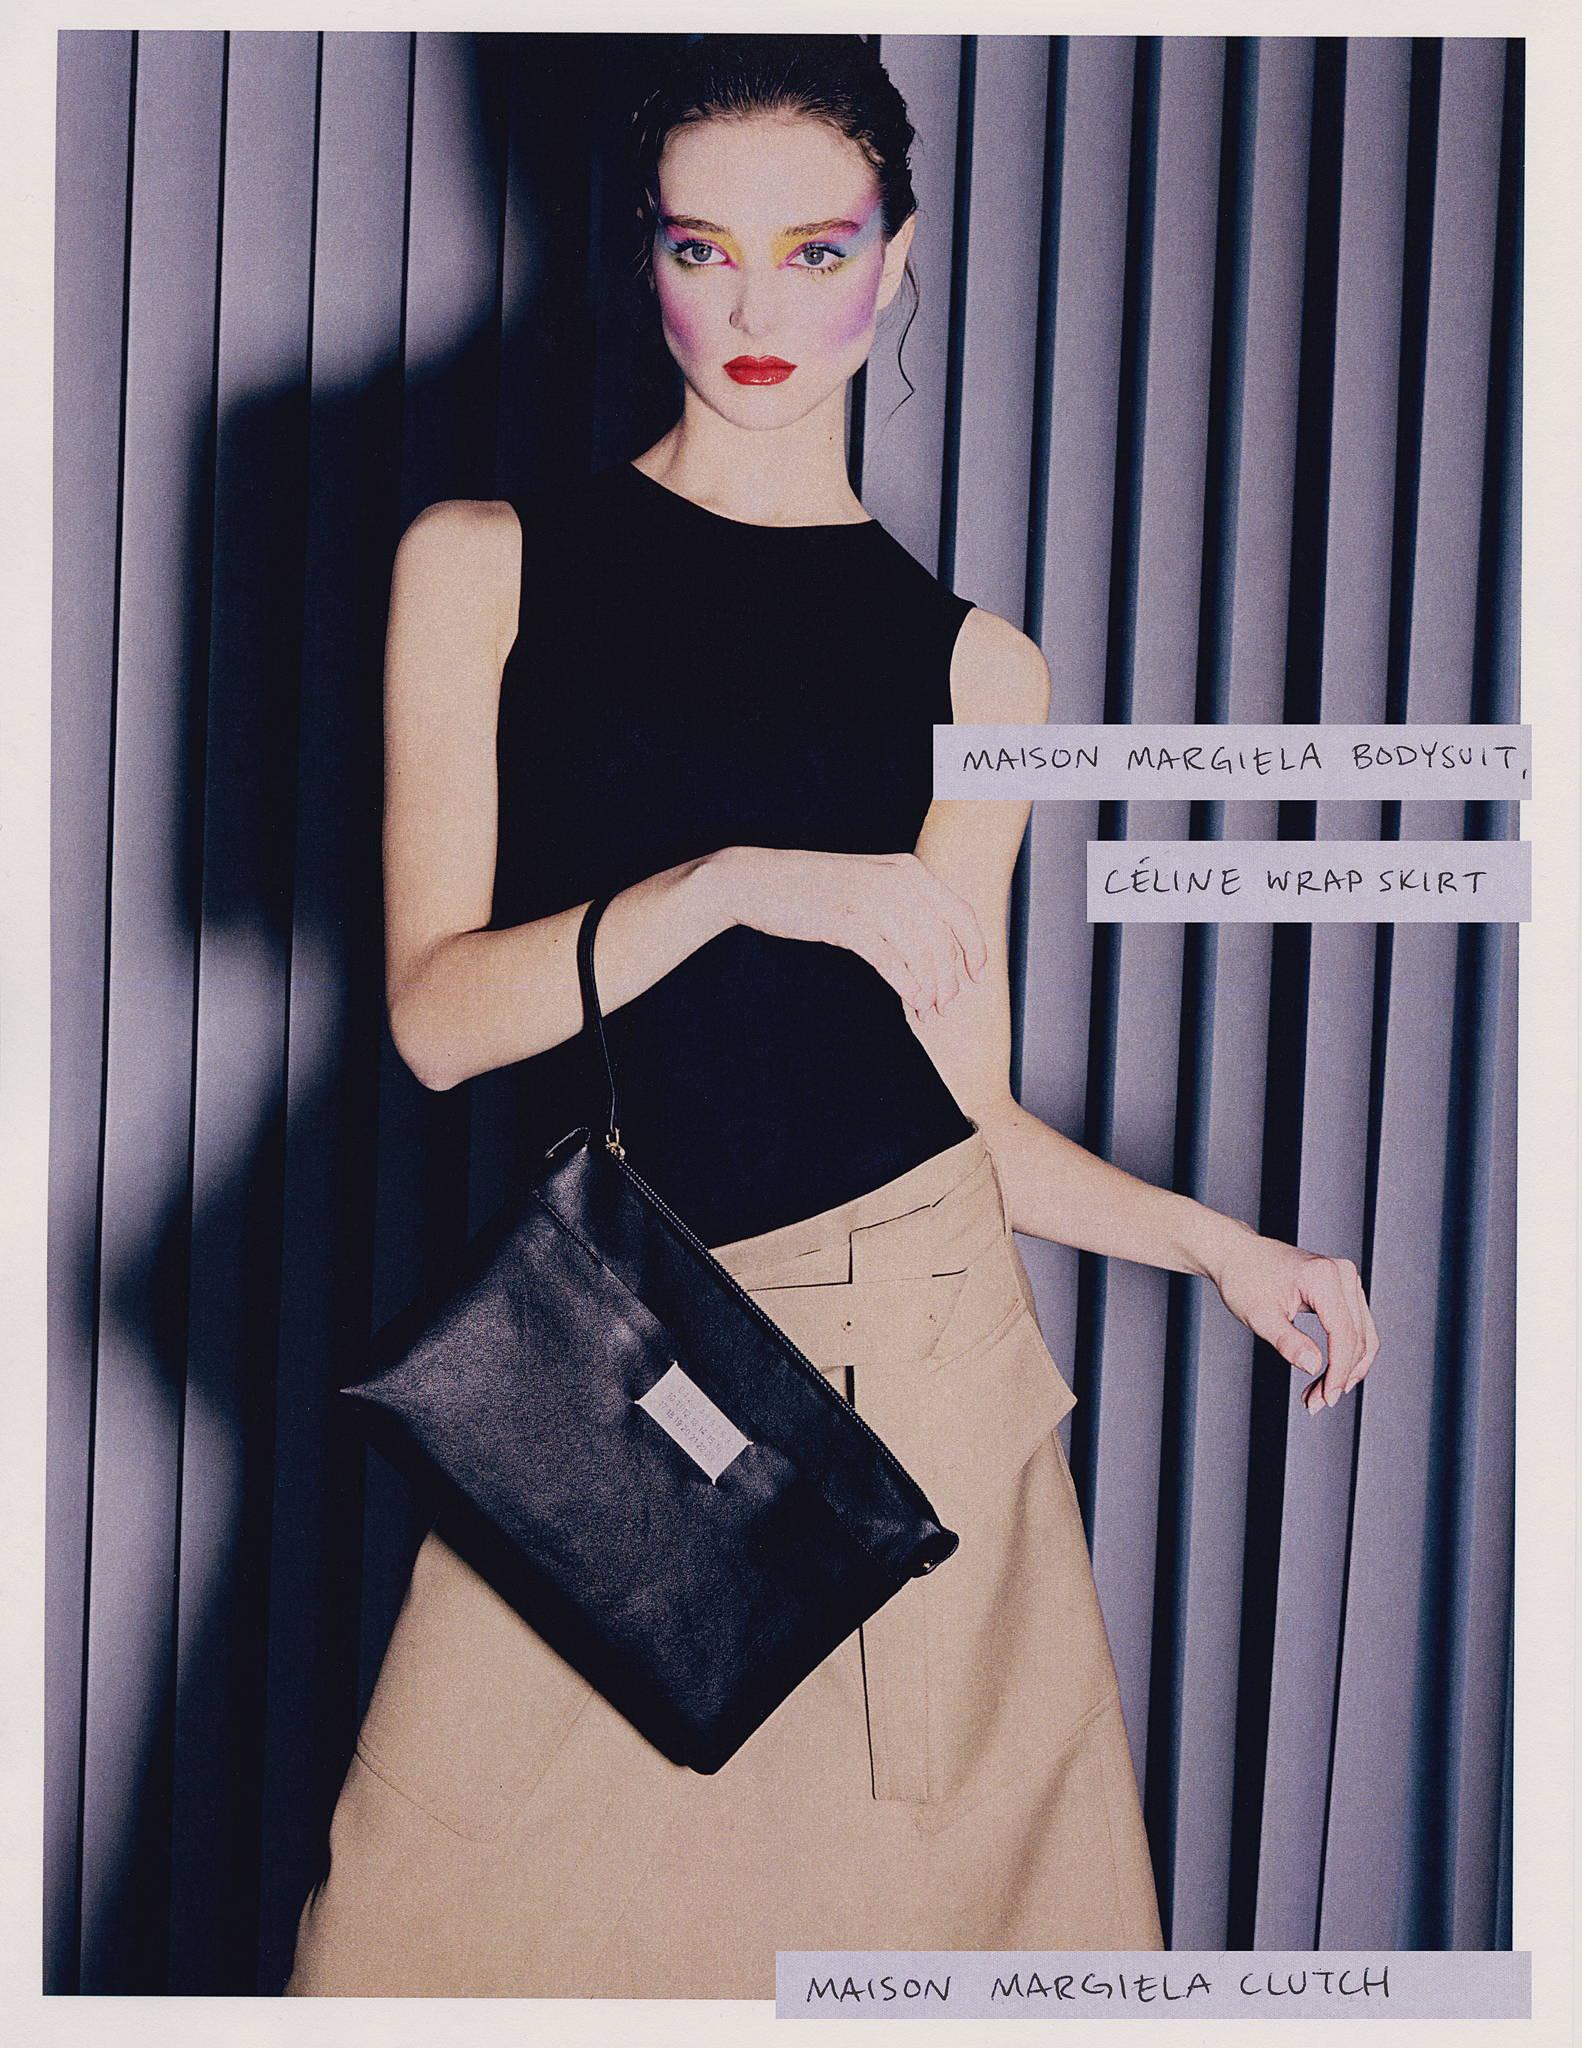 Maison Margiela bodysuit, Maison Margiela Clutch, Celine Wrap Skirt